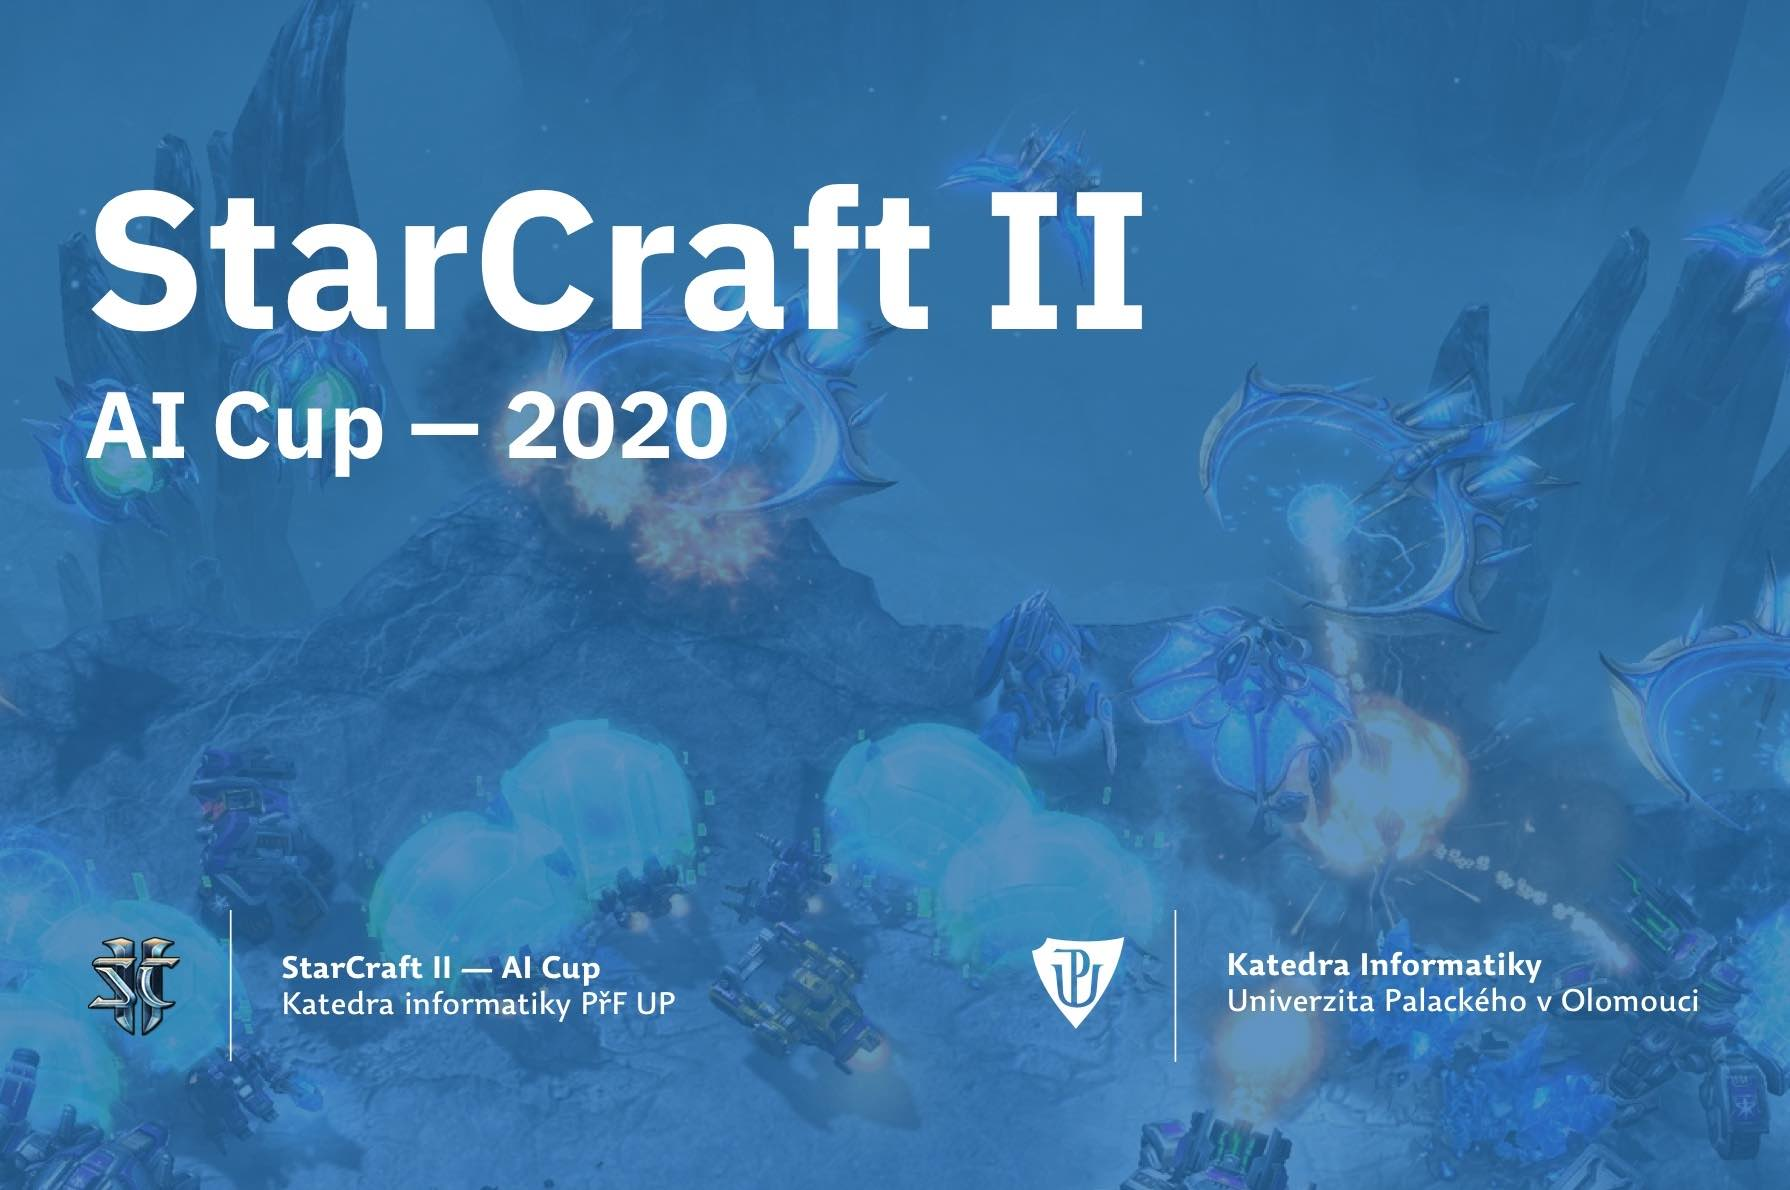 StarCraft II – AI Cup 2020